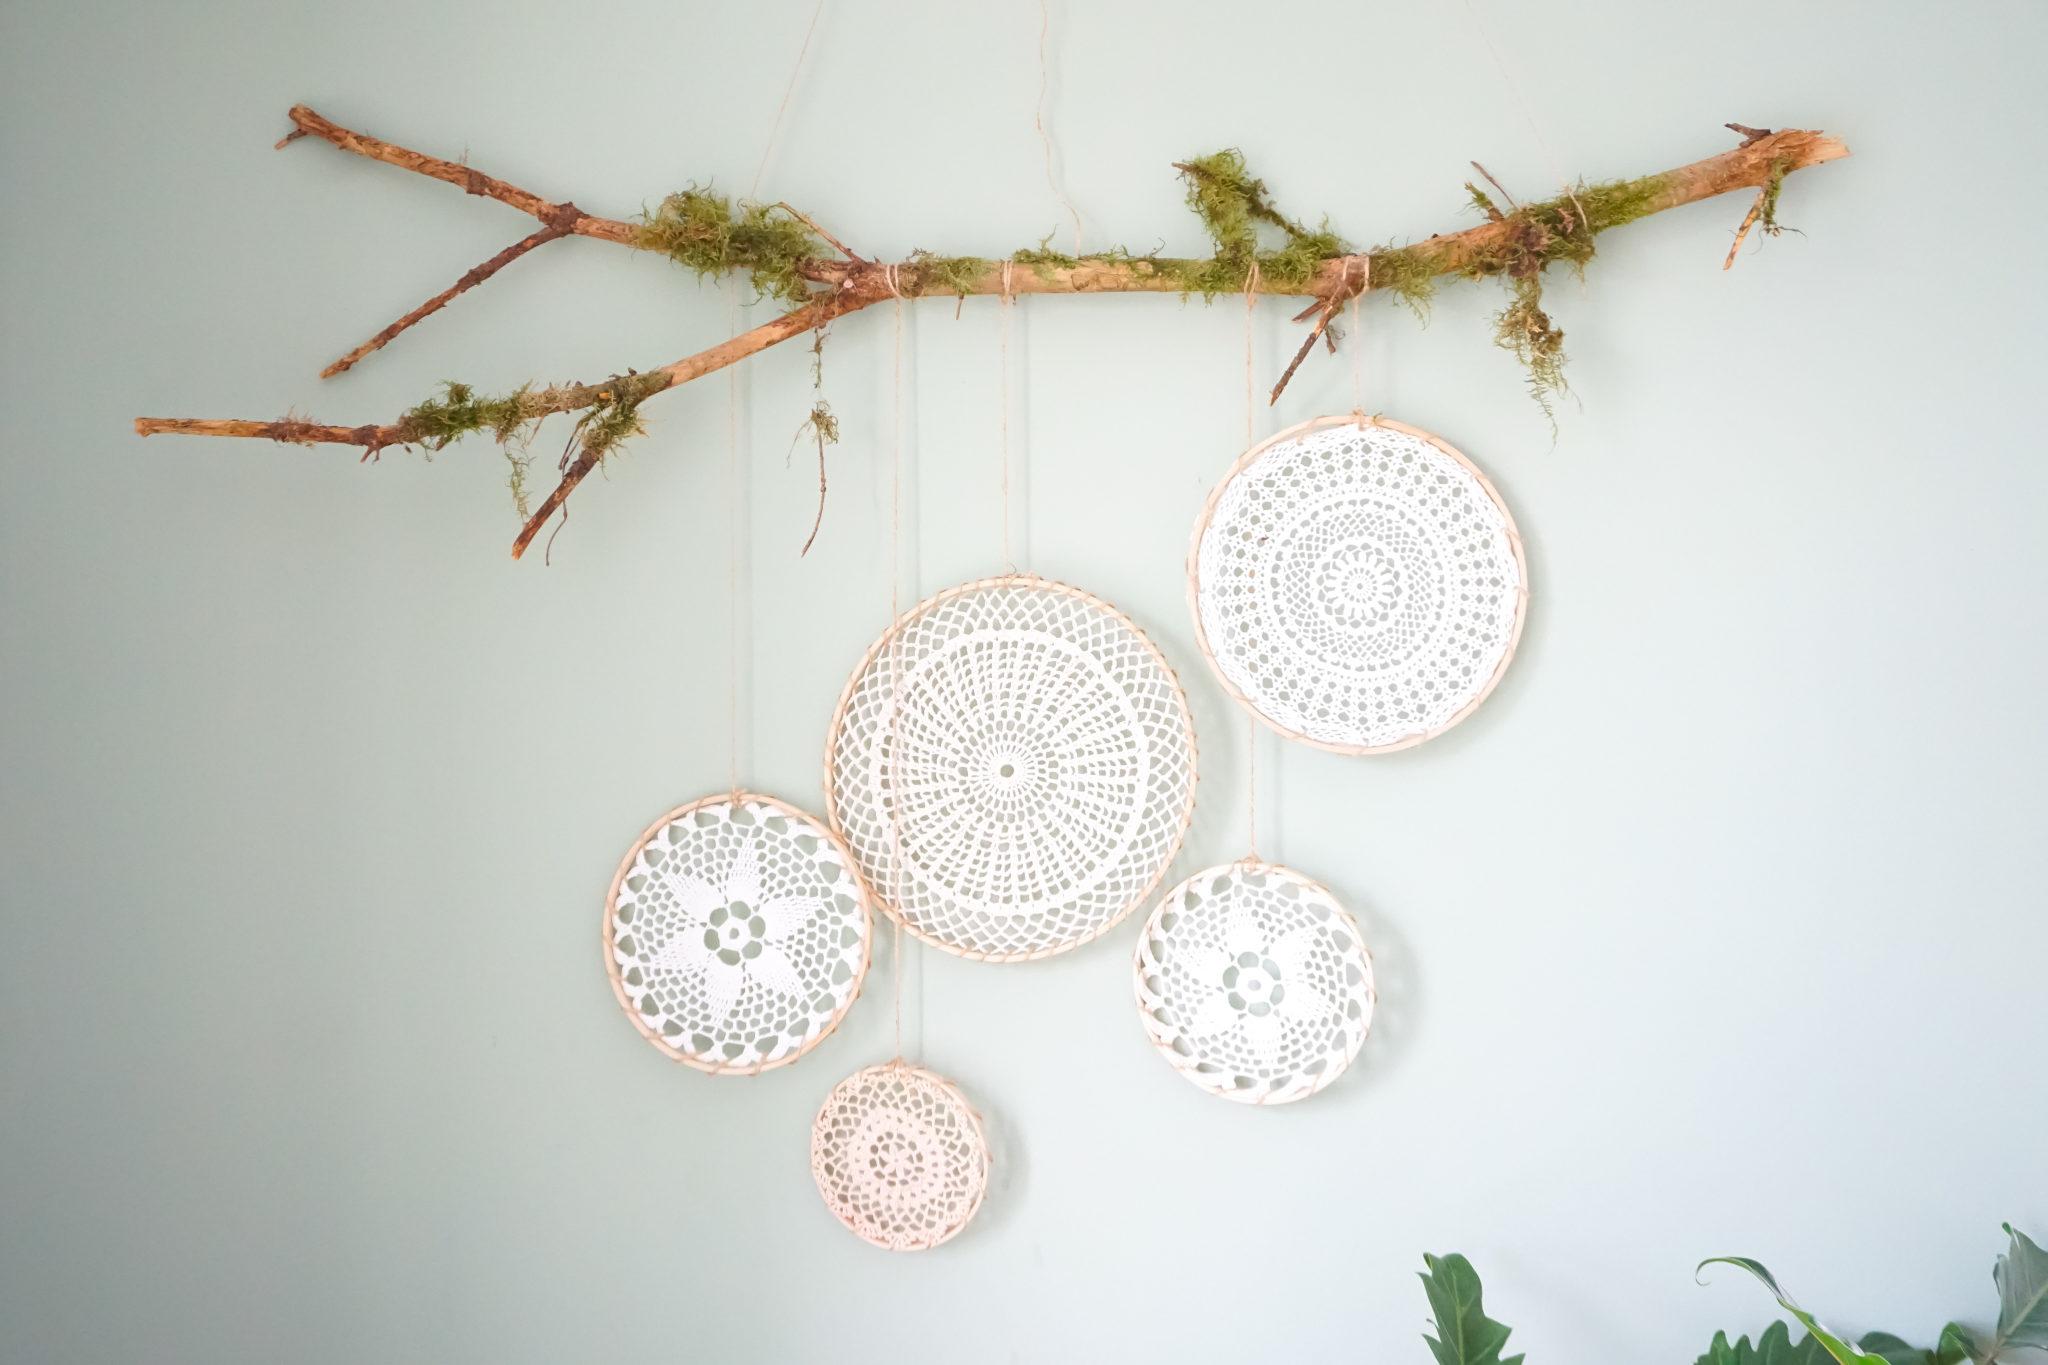 Wanddeko DIY Wandschmuck selber machen